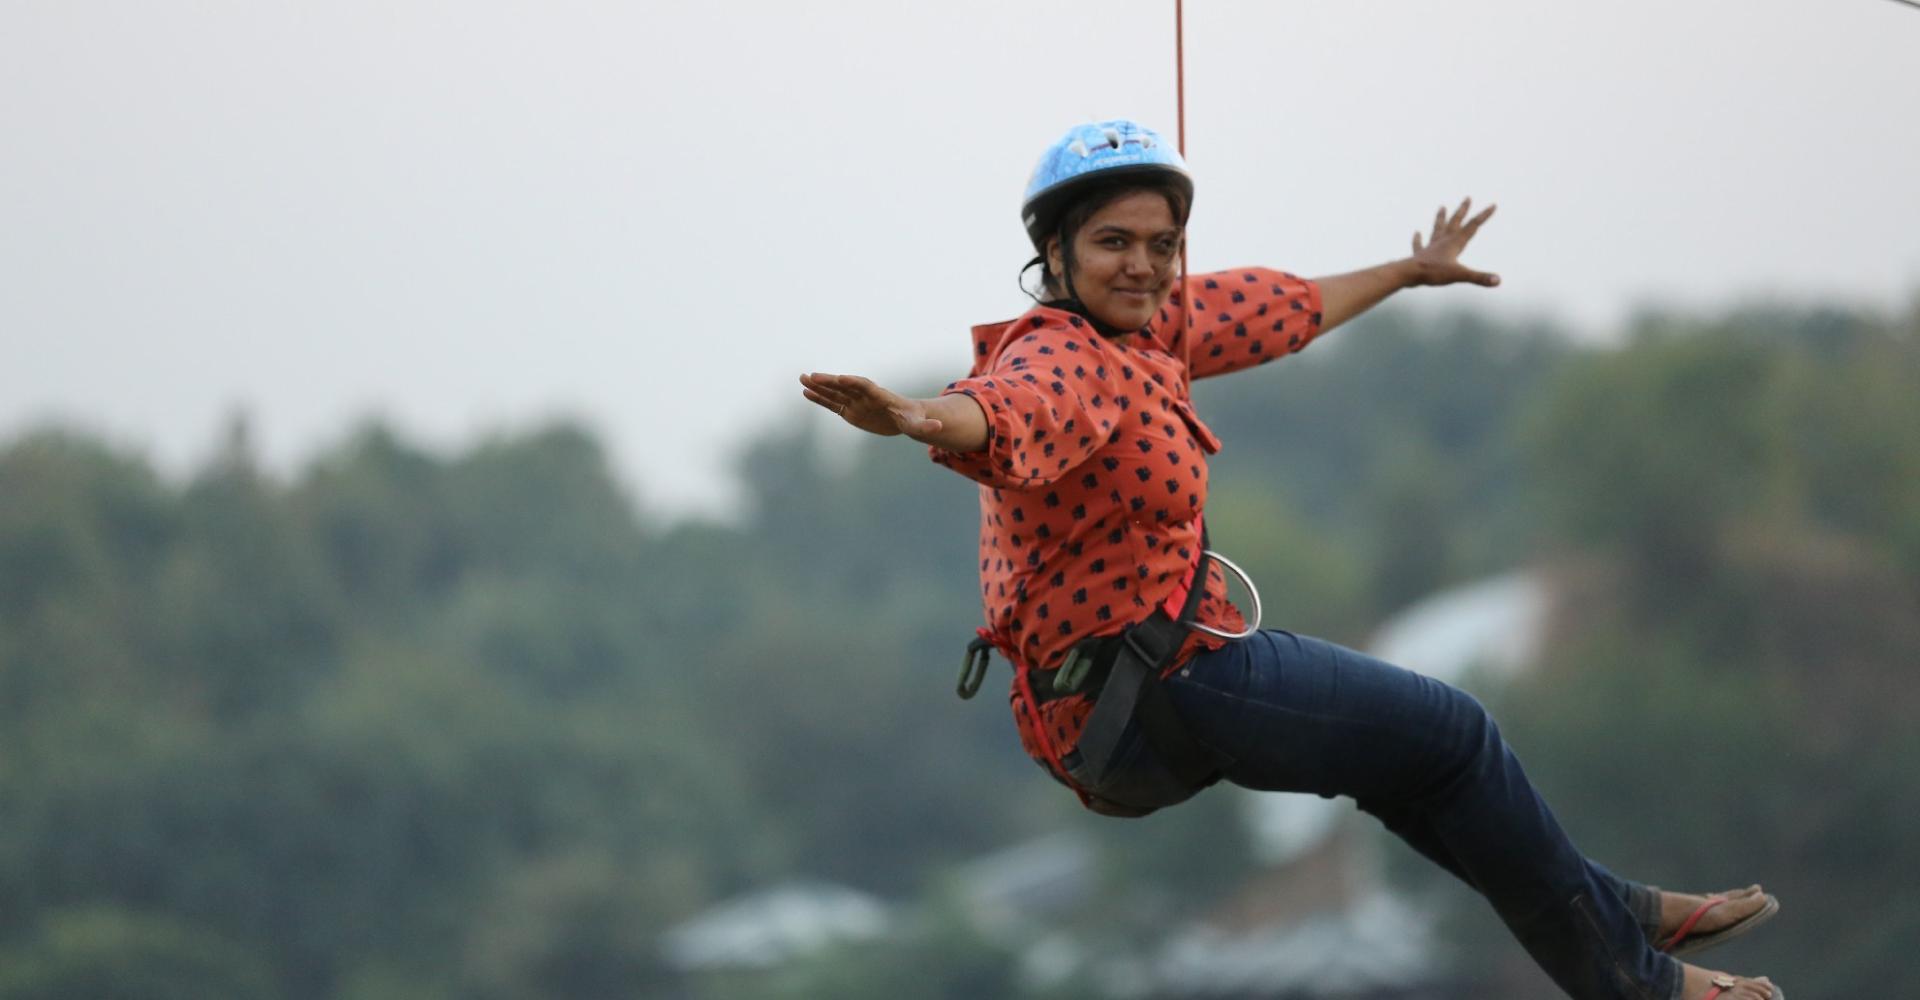 Zipline Setup In India